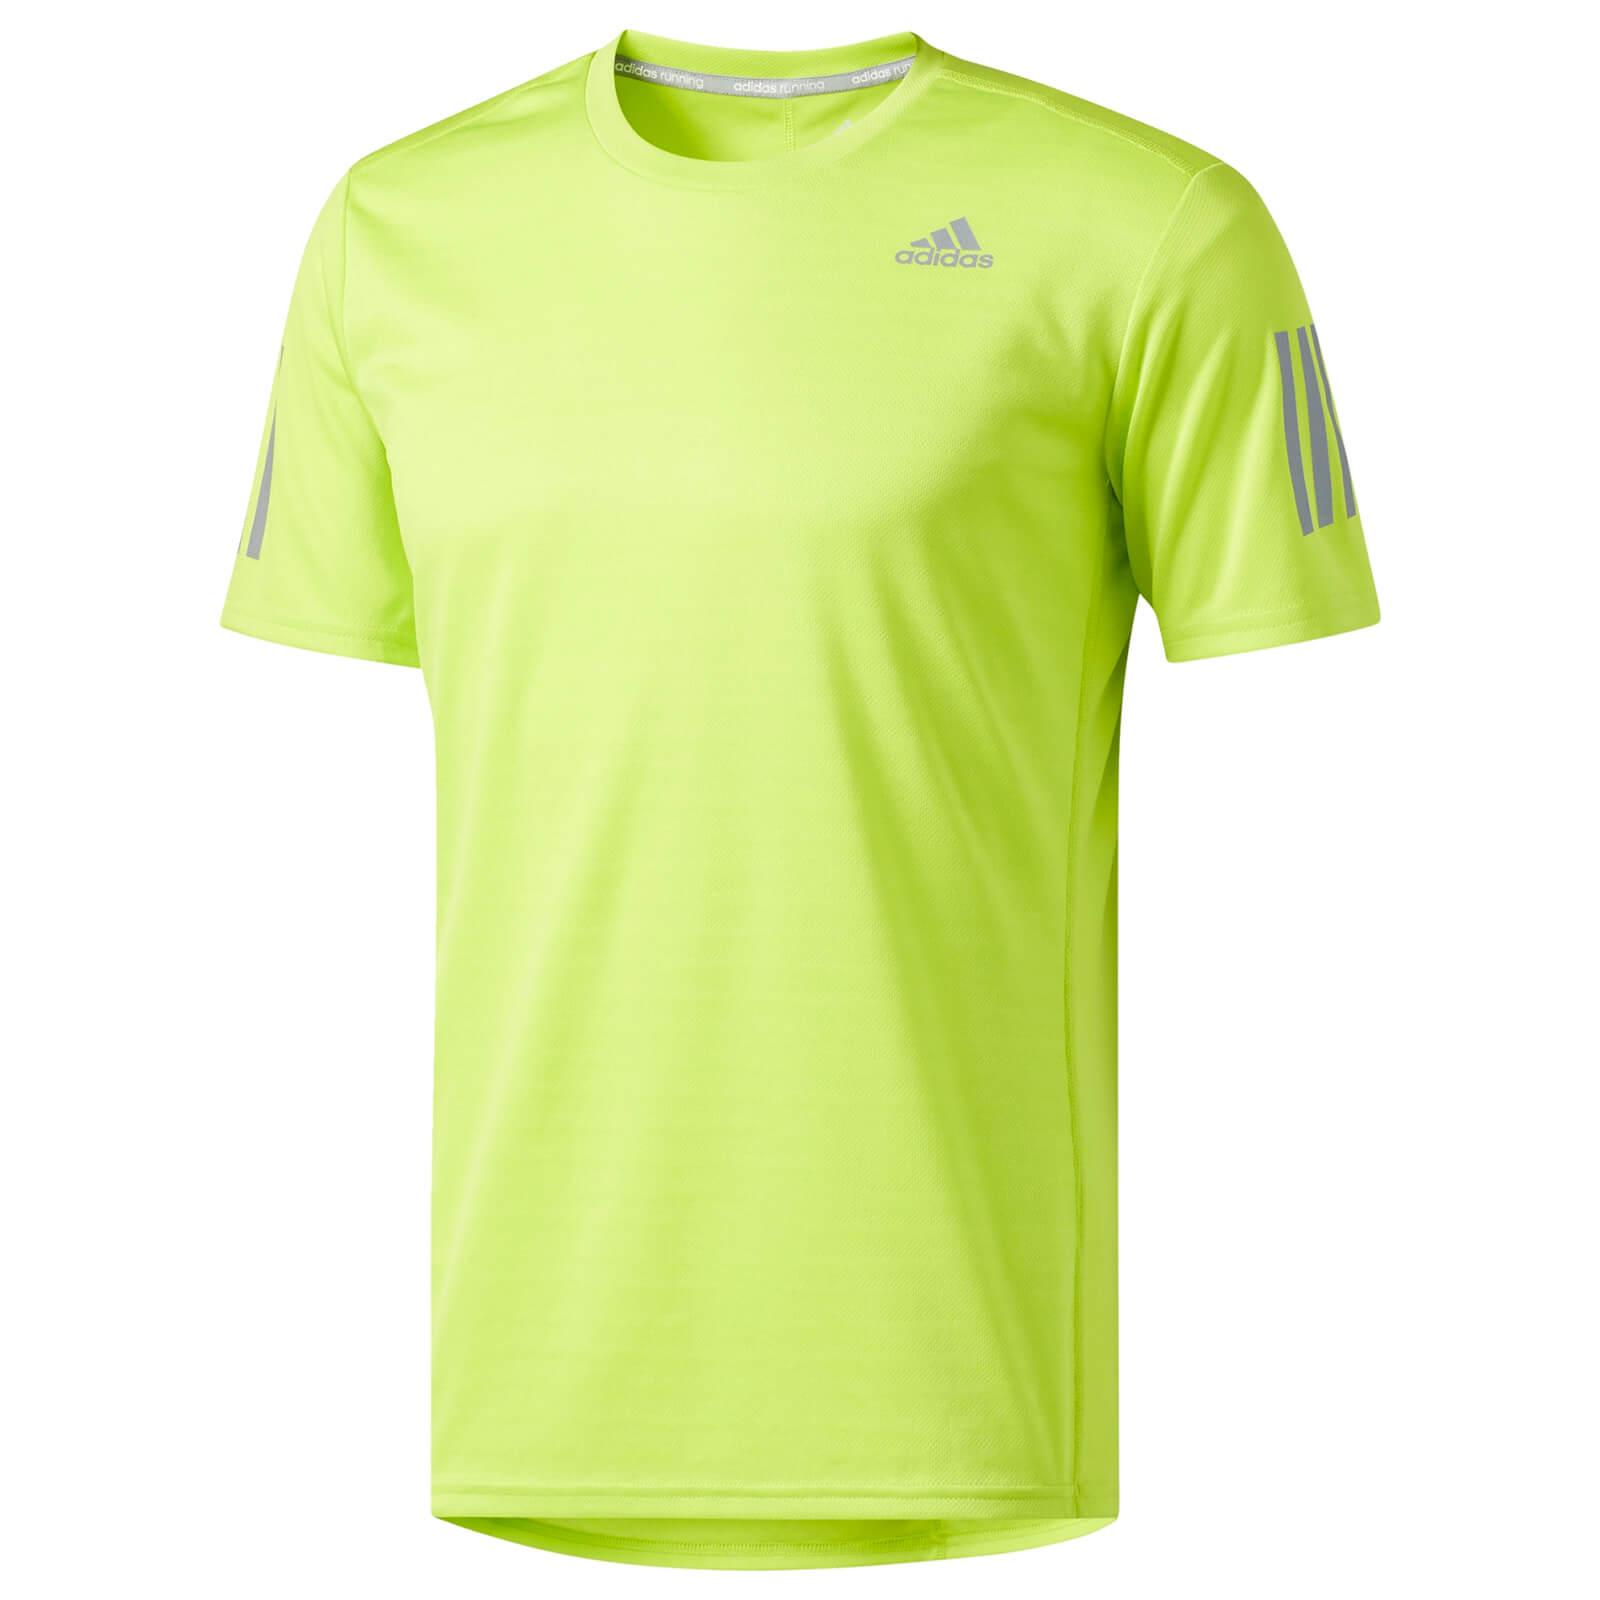 promo code c4d44 500a5 adidas Men s Supernova Running T-Shirt - Yellow Sports   Leisure    TheHut.com